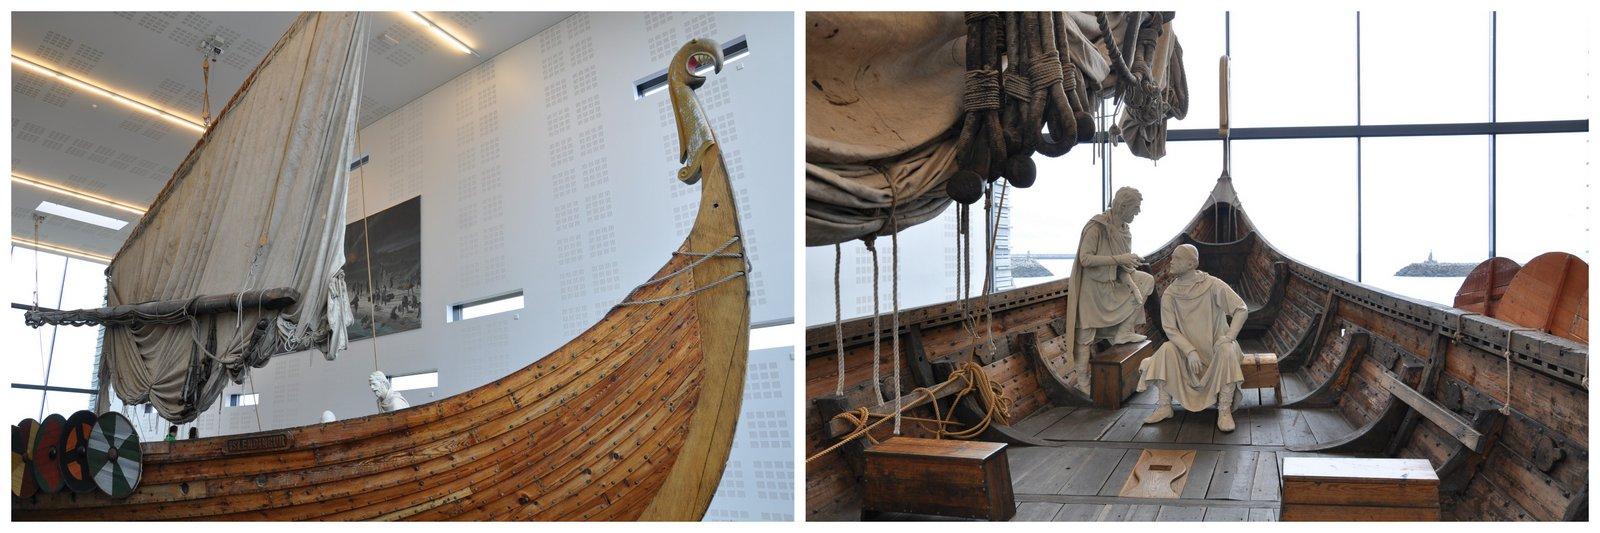 visita-keflavik-museo-viking-islendingur